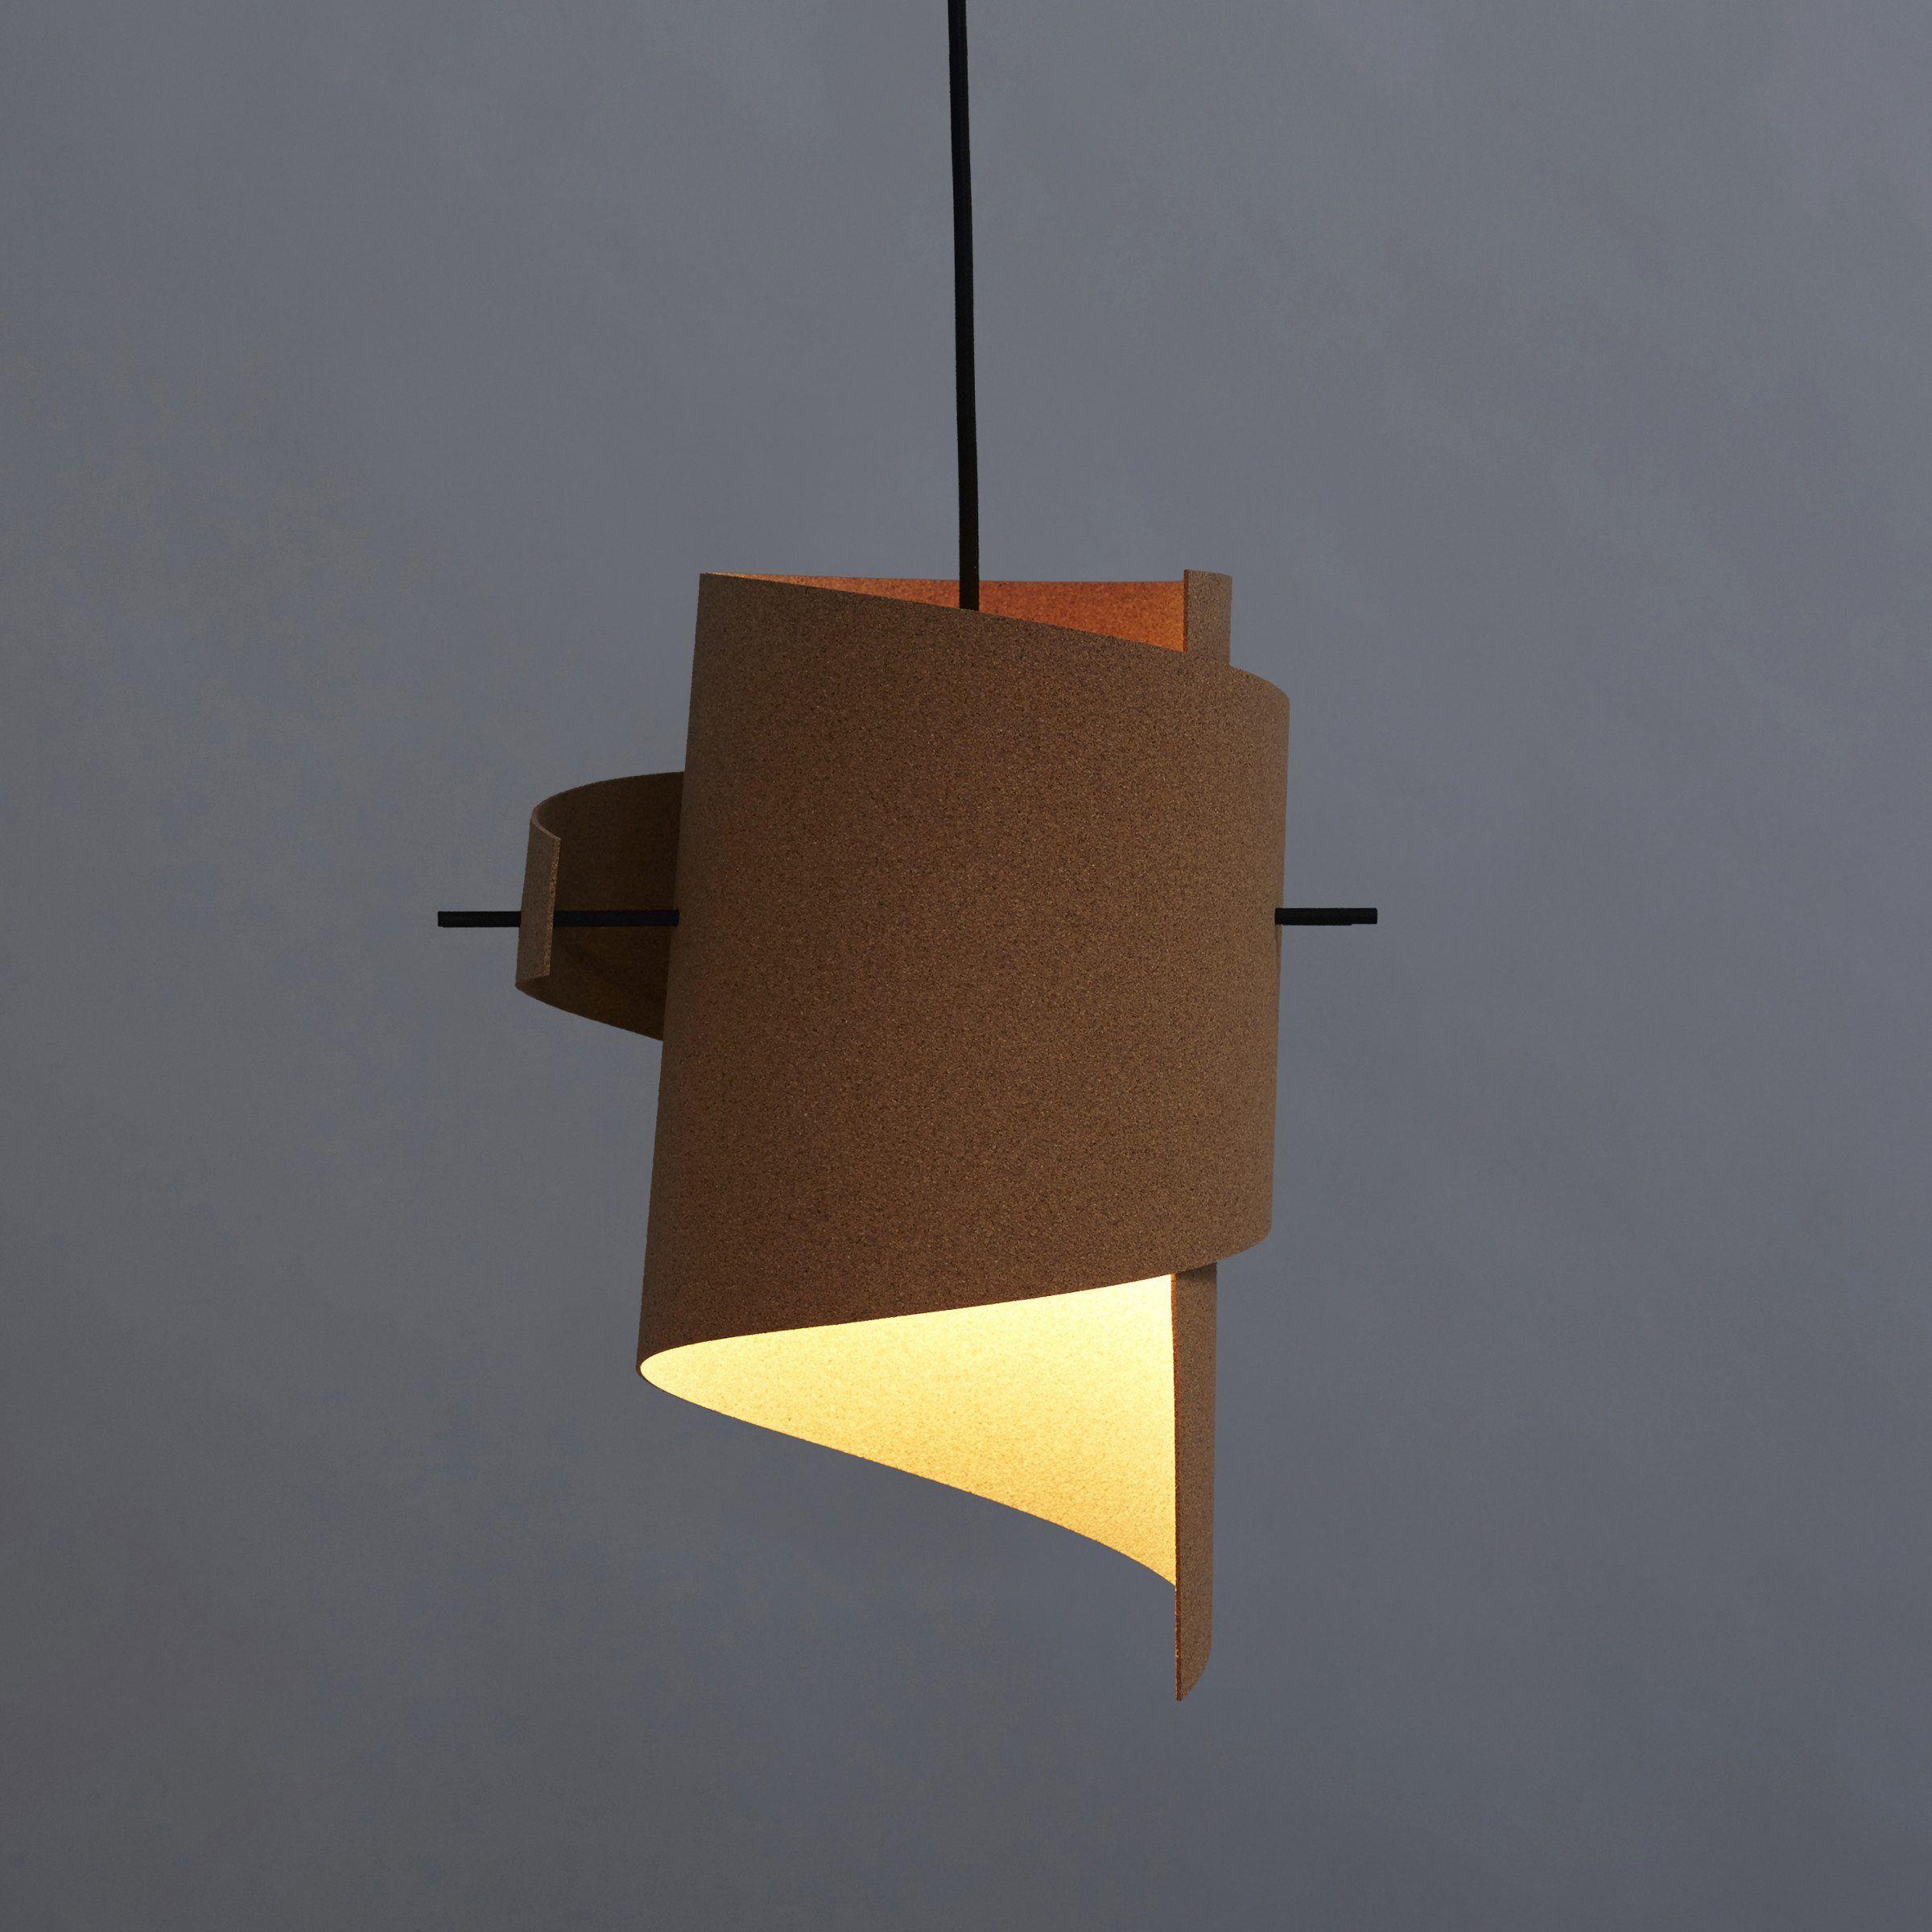 ML01 lamp cork | Black stains, Cork and Light bulb